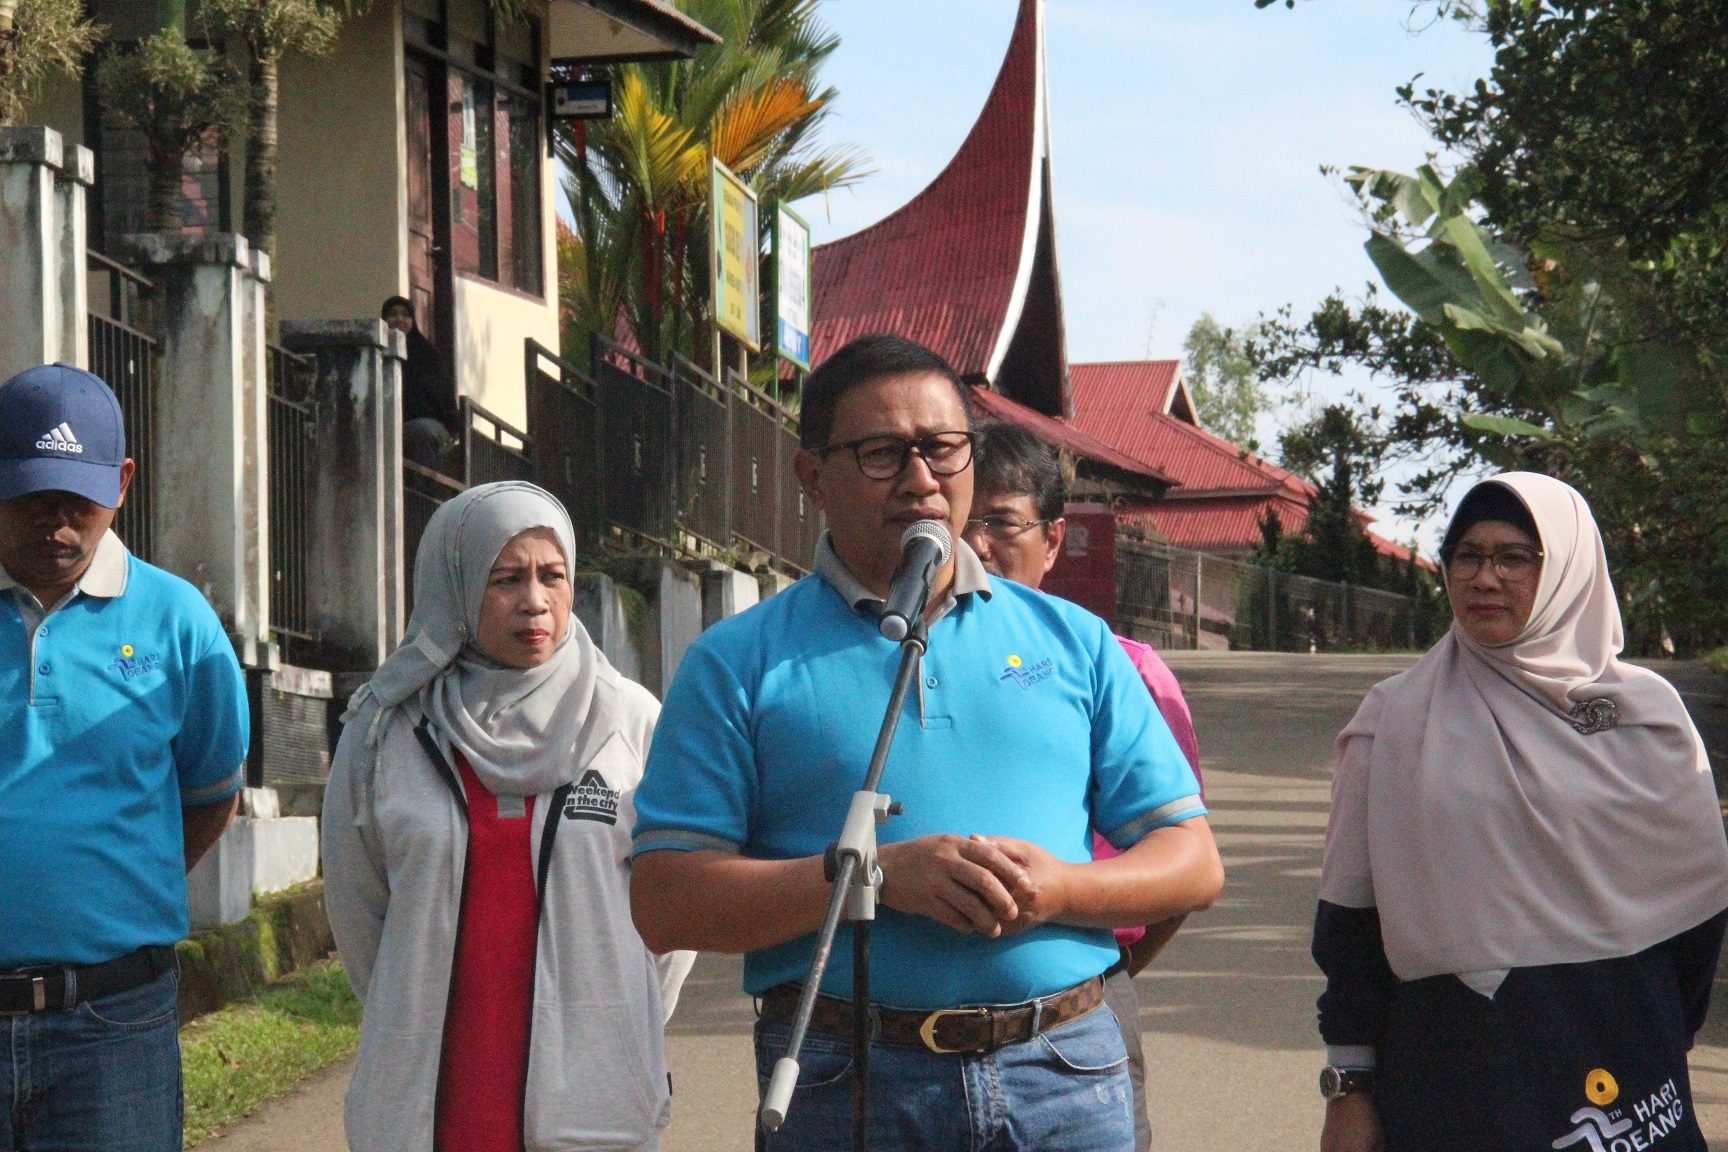 Walikota Bukittinggi Buka Jalan Sehat dan Bakti Lingkungan Hari Oeang Ke-72